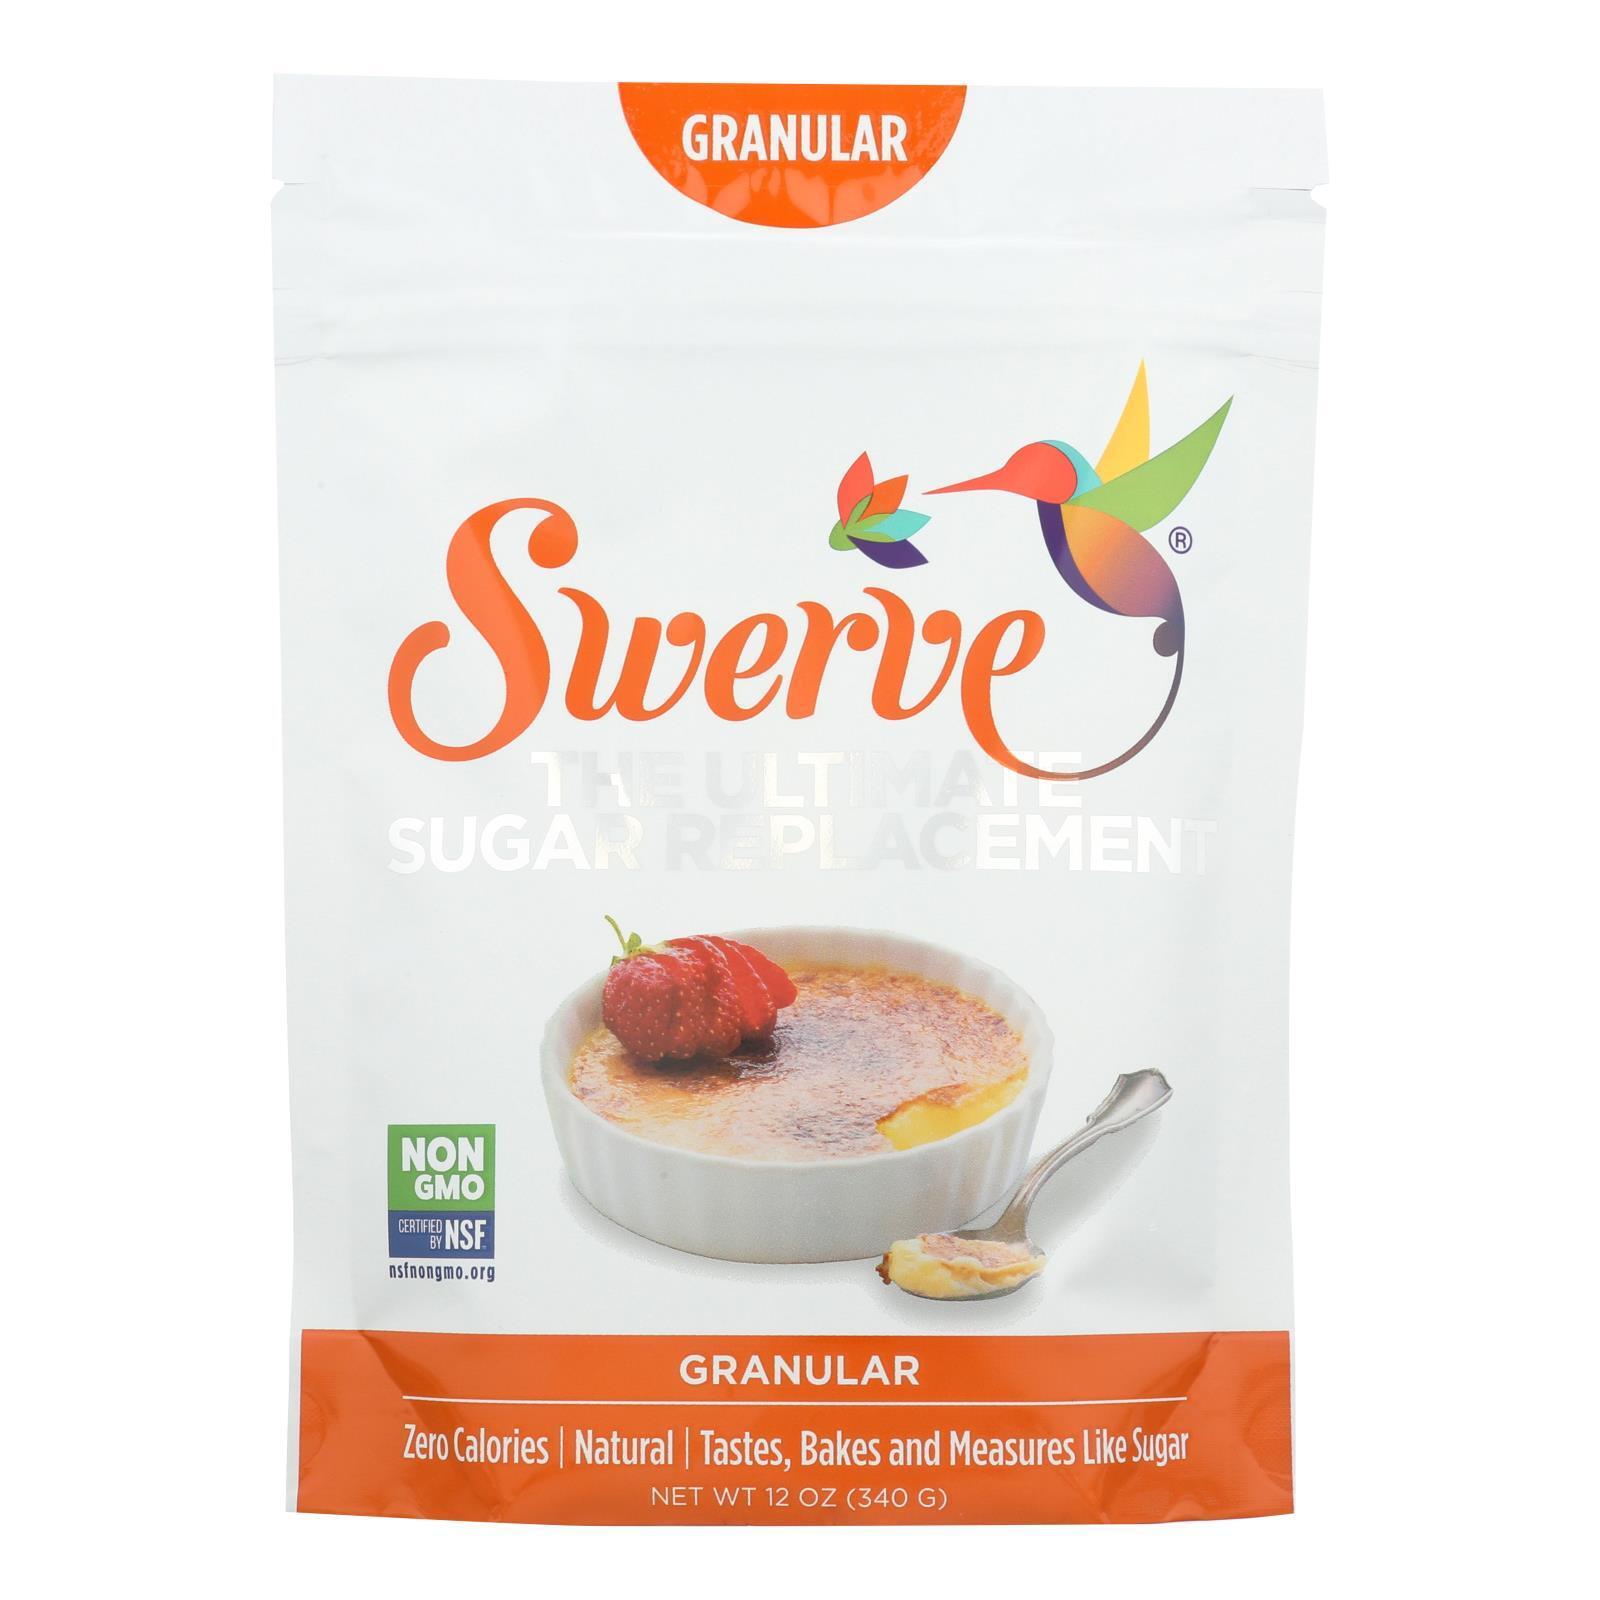 Swerve Sweetener - Granular - Case of 6 - 12 oz.